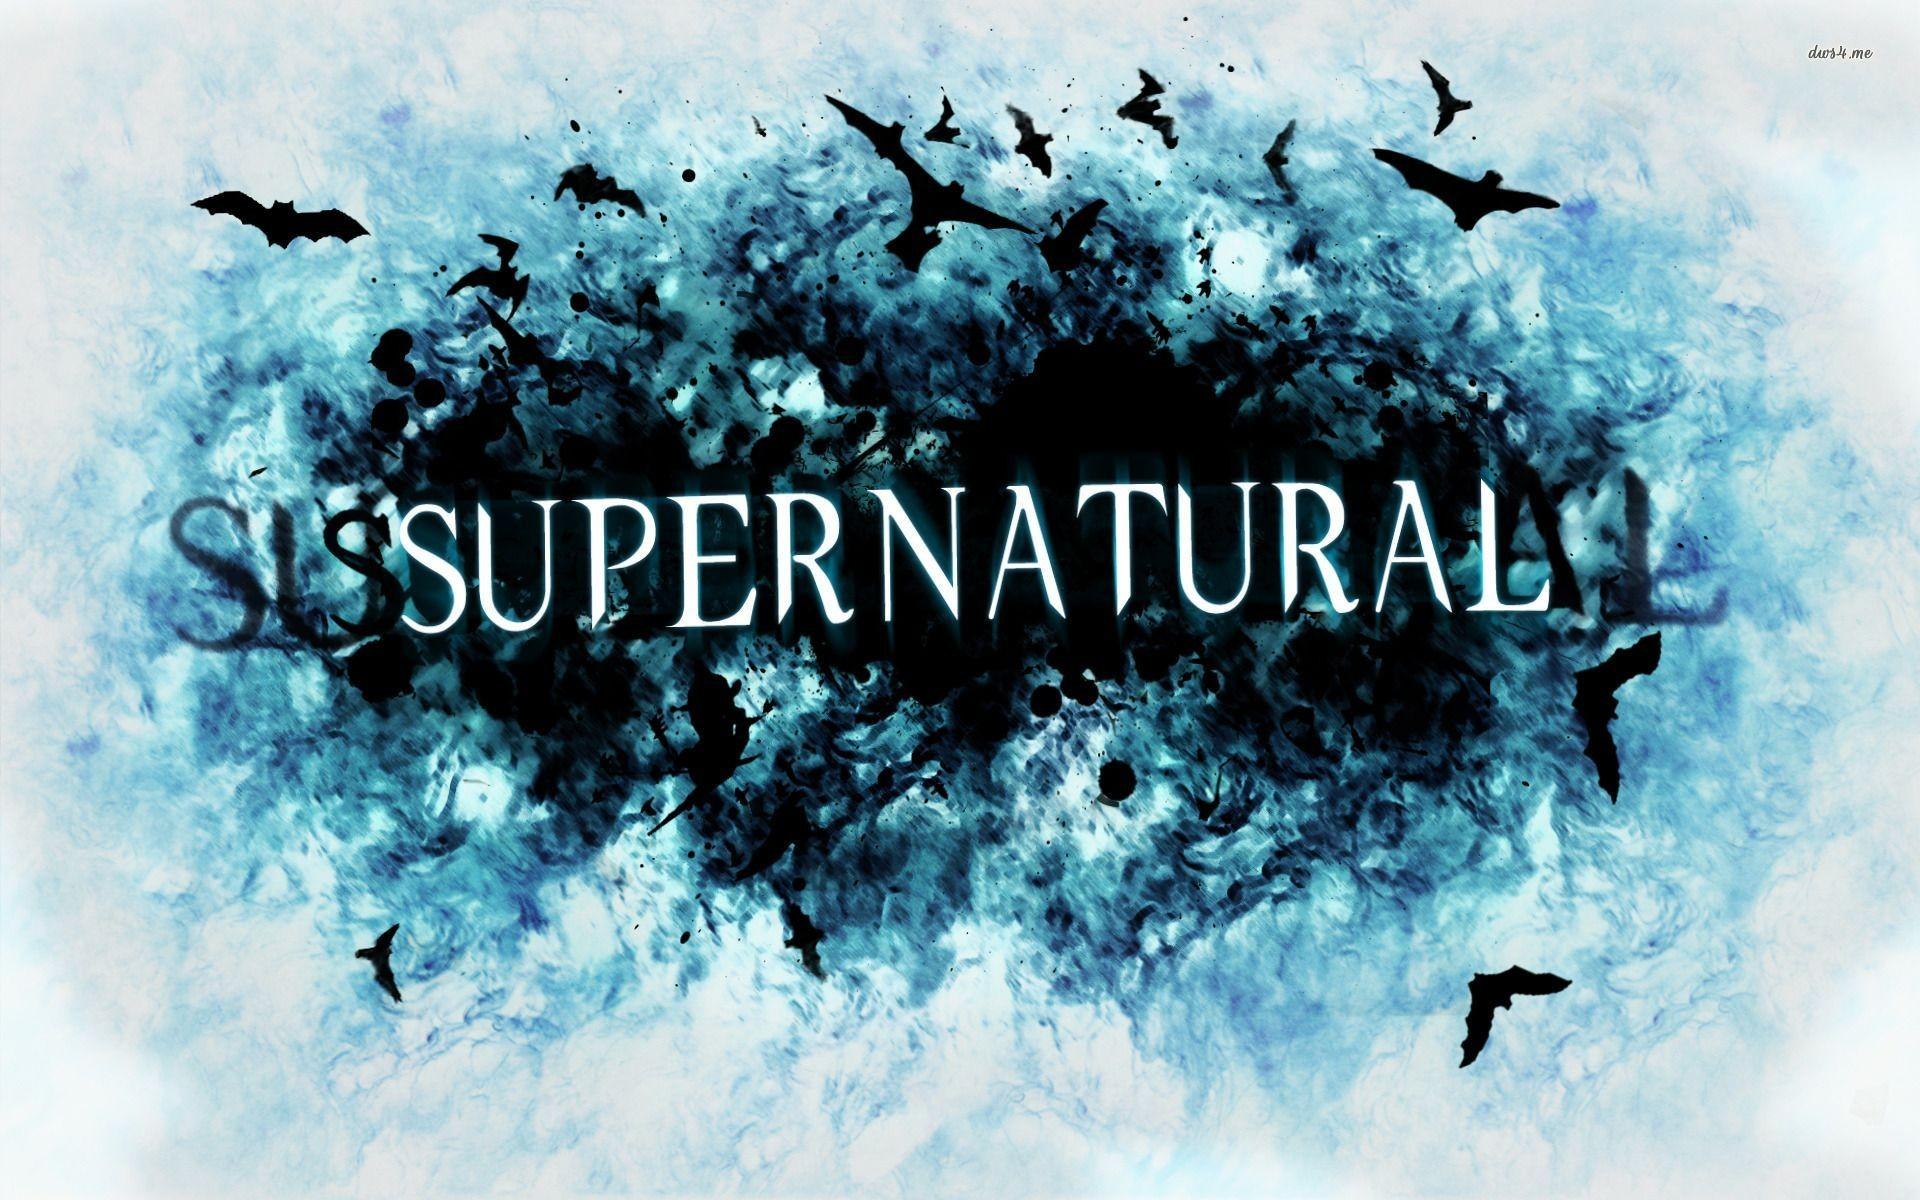 Supernatural wallpaper – TV Show wallpapers – #7167